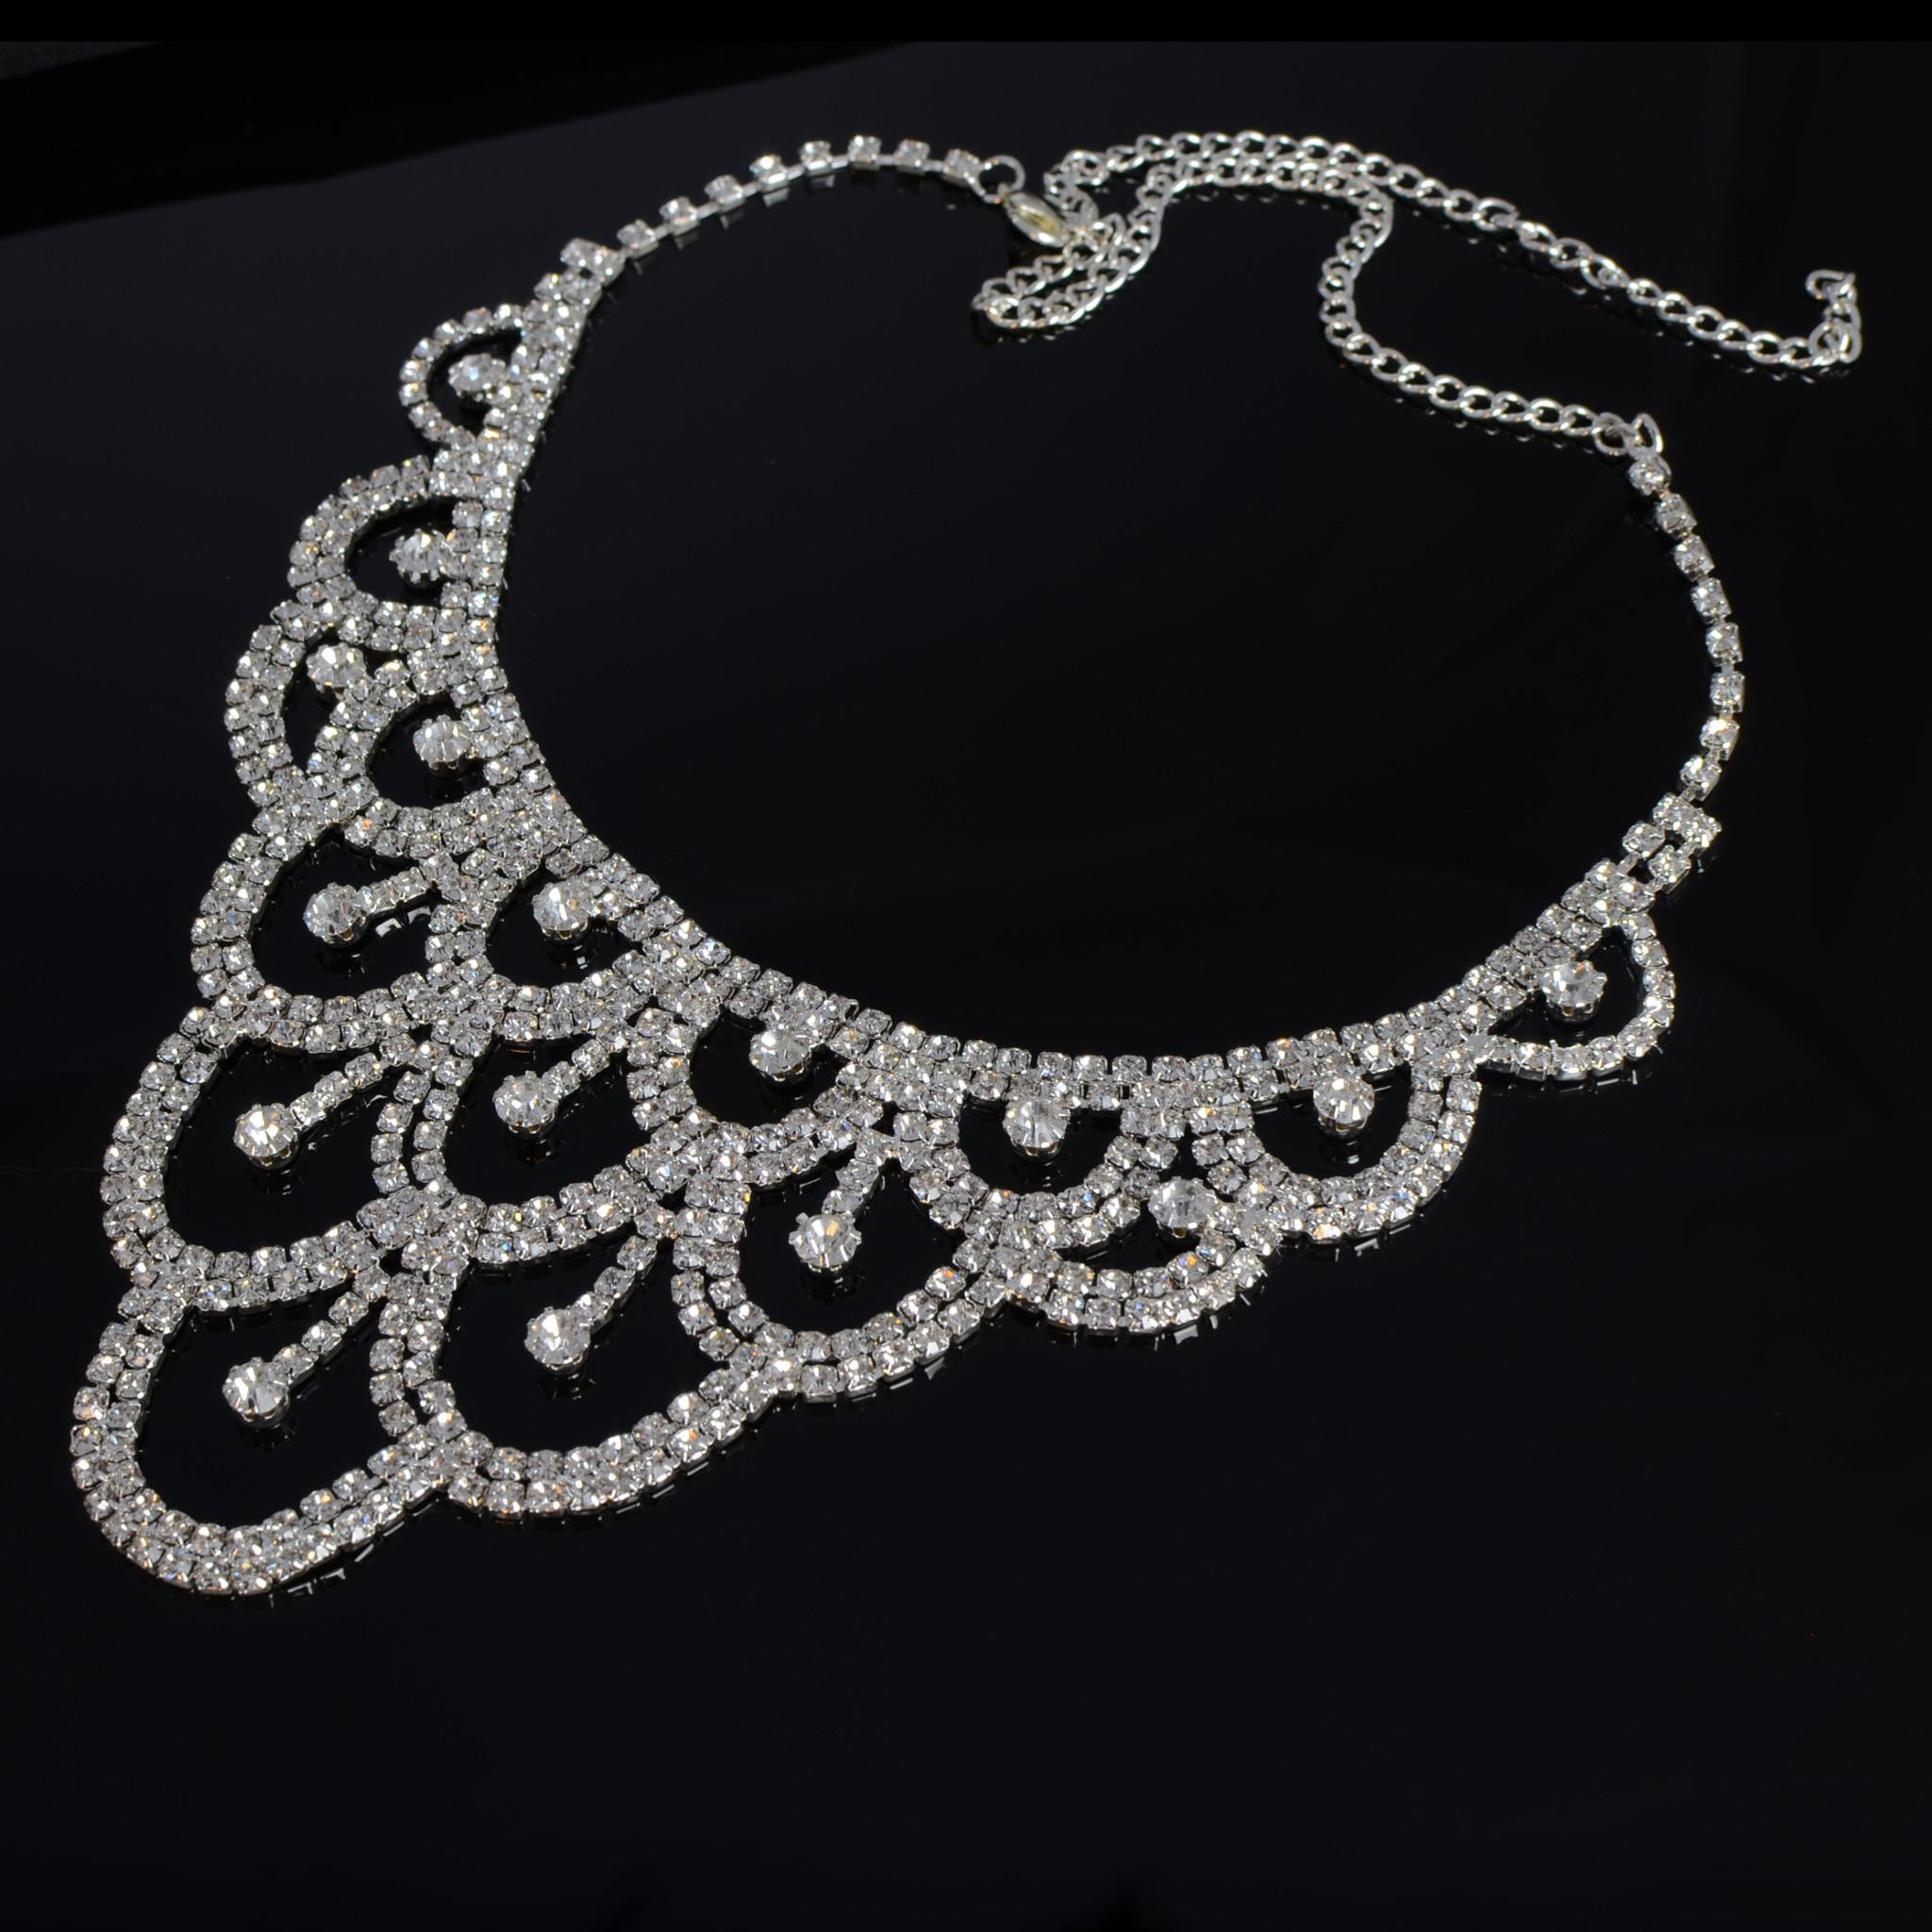 Bruidscollier  Silvi - Zilver